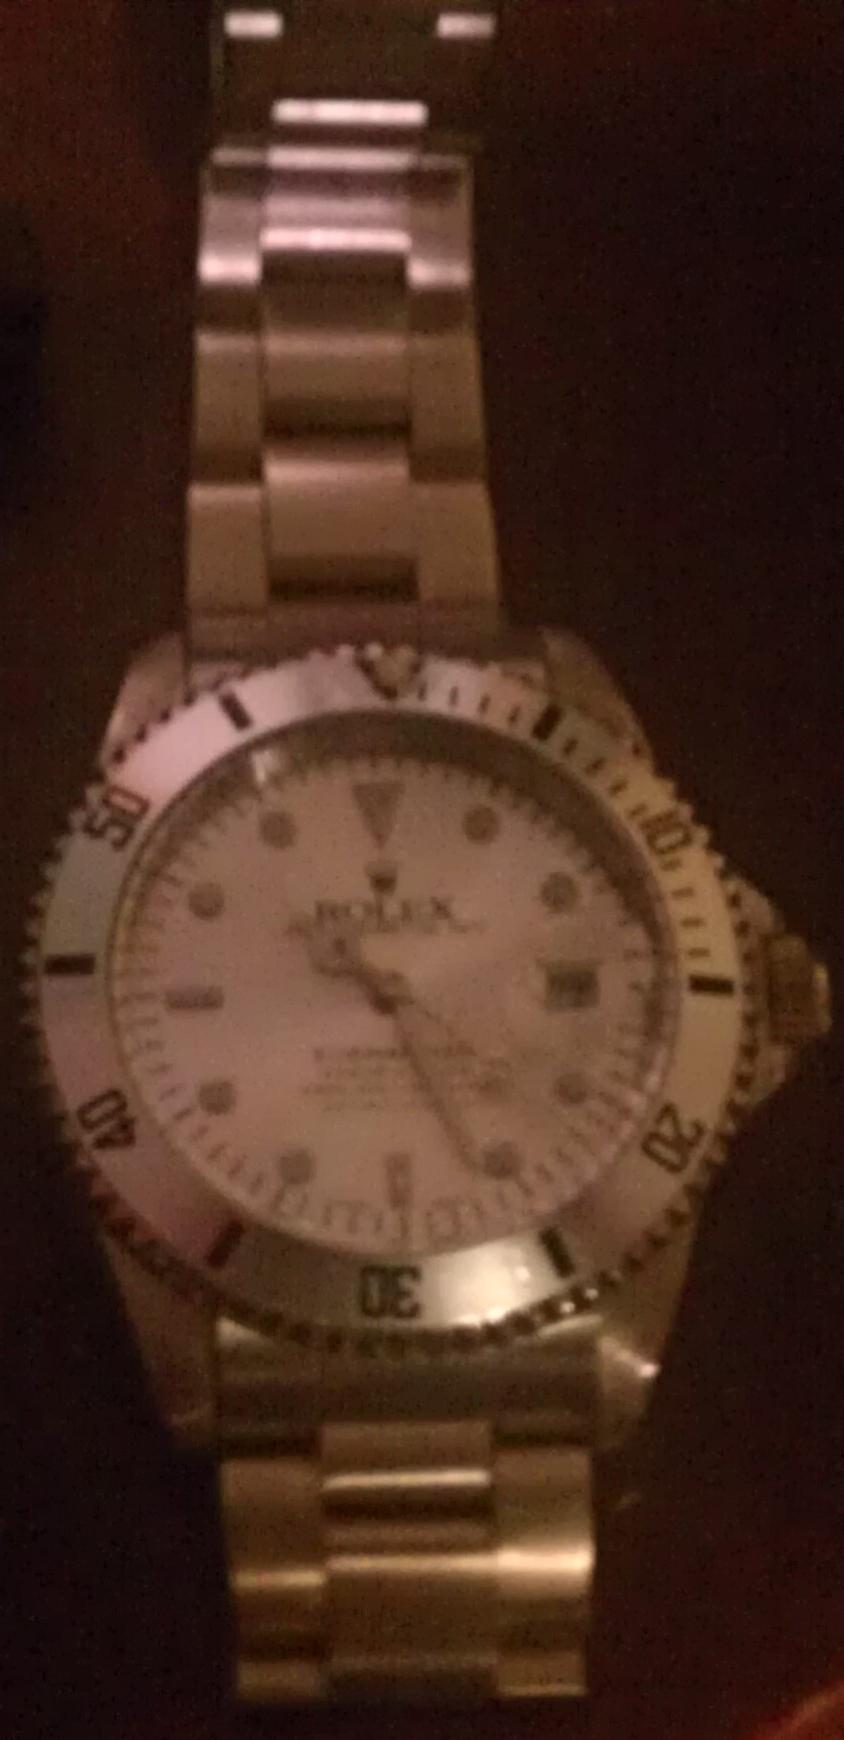 China fake Rolex in Carson City